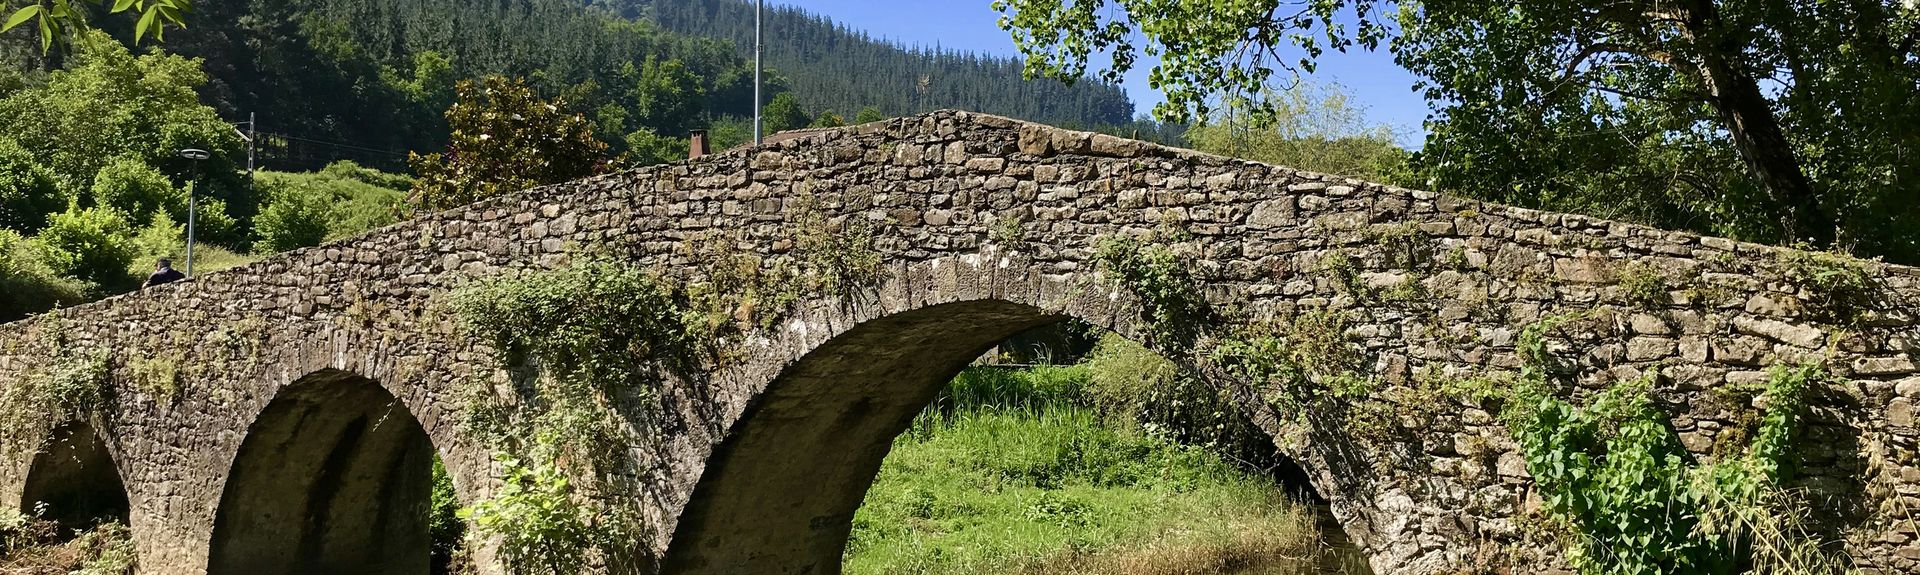 Erbi, Ayala, País Basco, Espanha